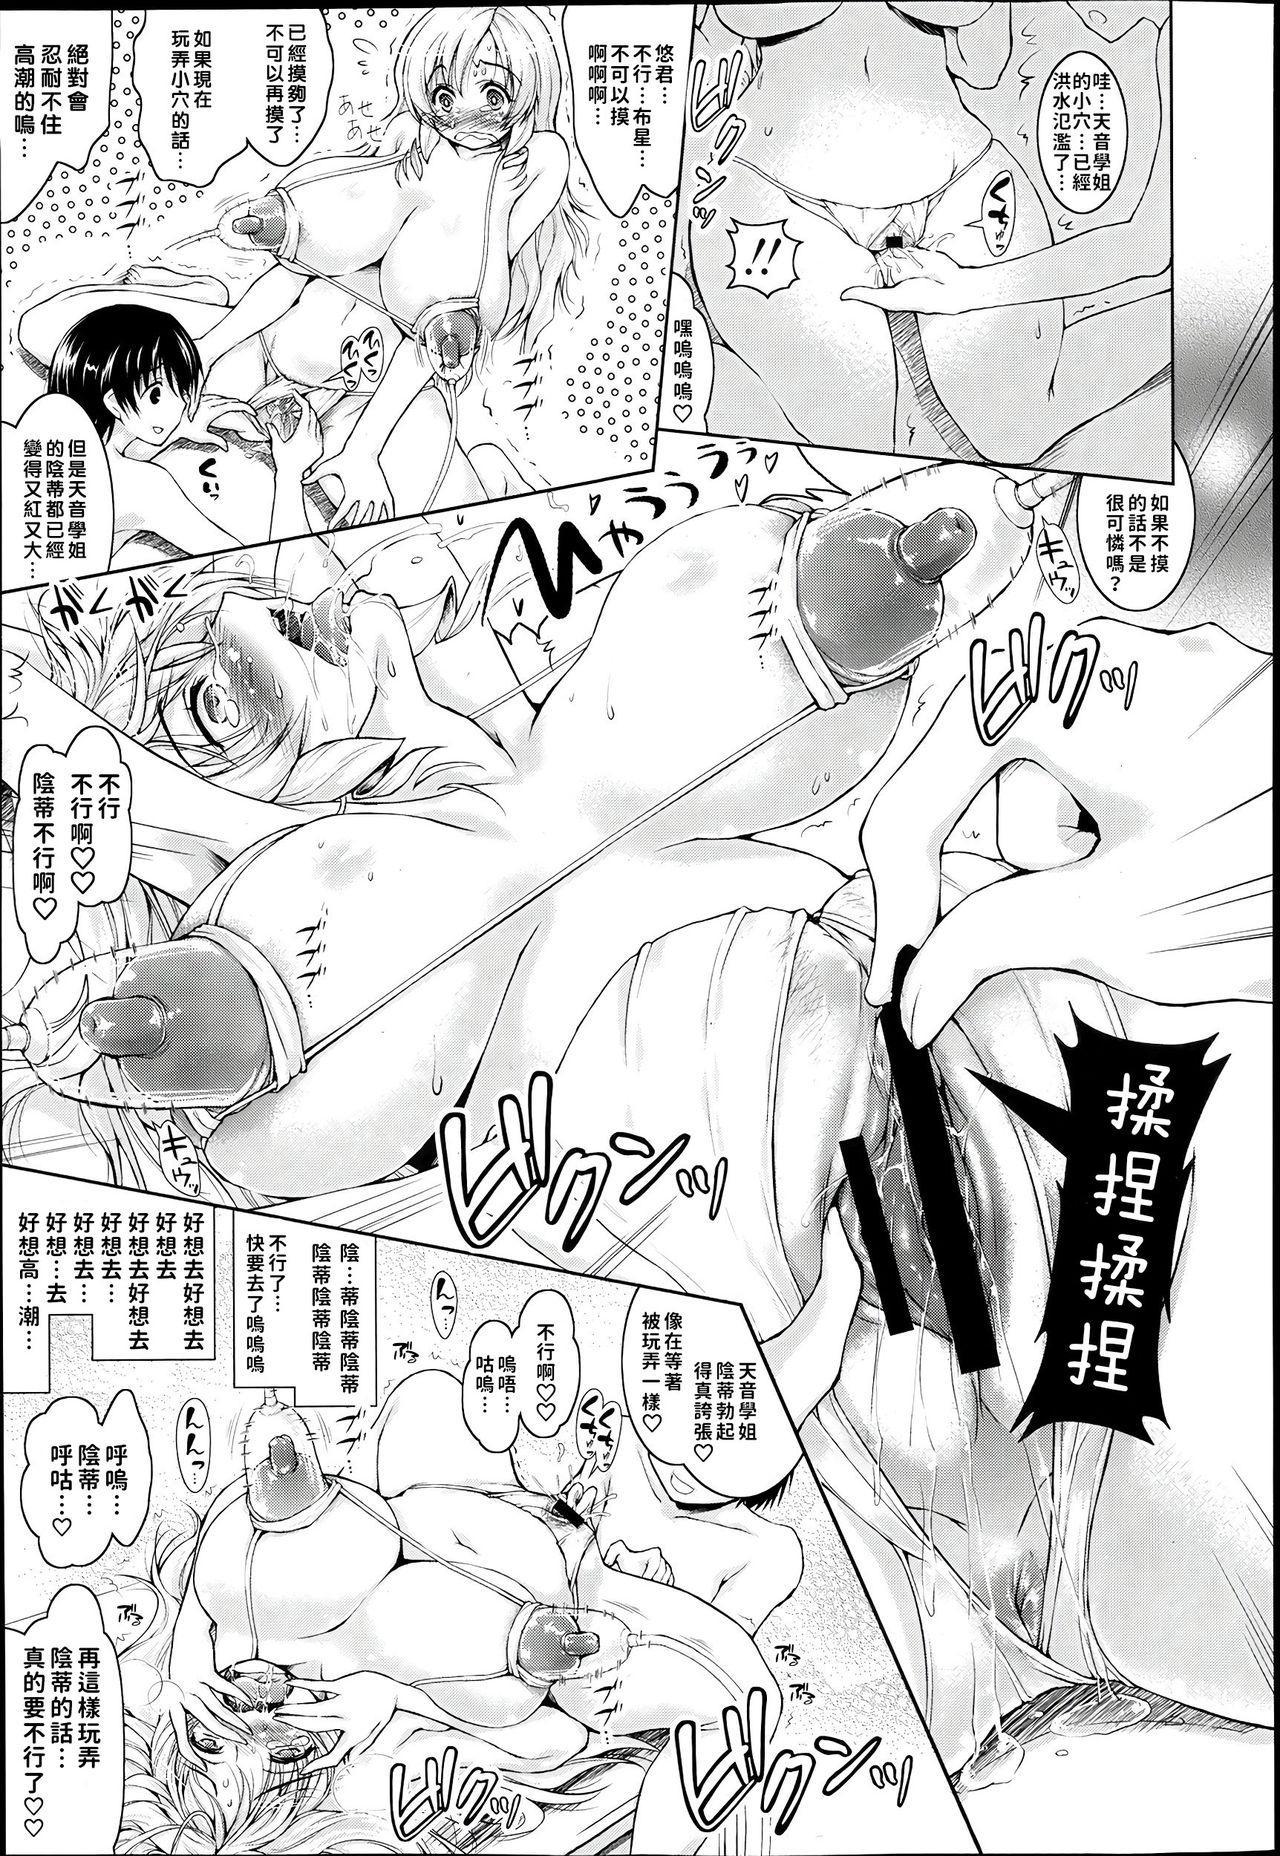 [Yameta Takashi] Ikenai Amane-san   The Naughty Amane-san (COMIC Tenma 2013-06) [Chinese] [巨乳星人個人漢化] 16